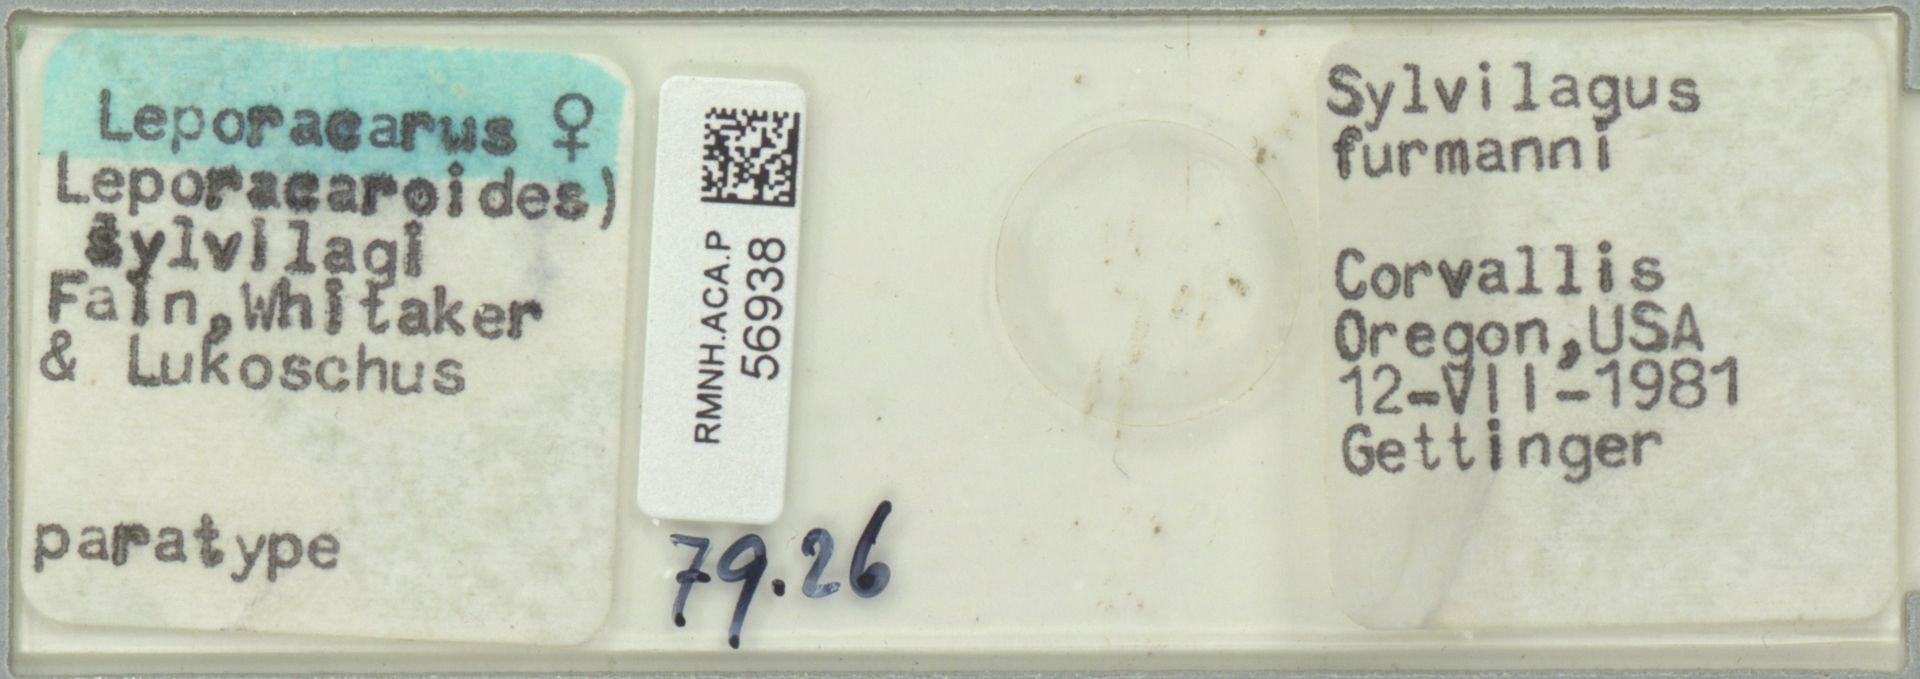 RMNH.ACA.P.56938 | Leporacarus (Leporacaroides) sylvilagi Fain, Whitaker & Lukoschus